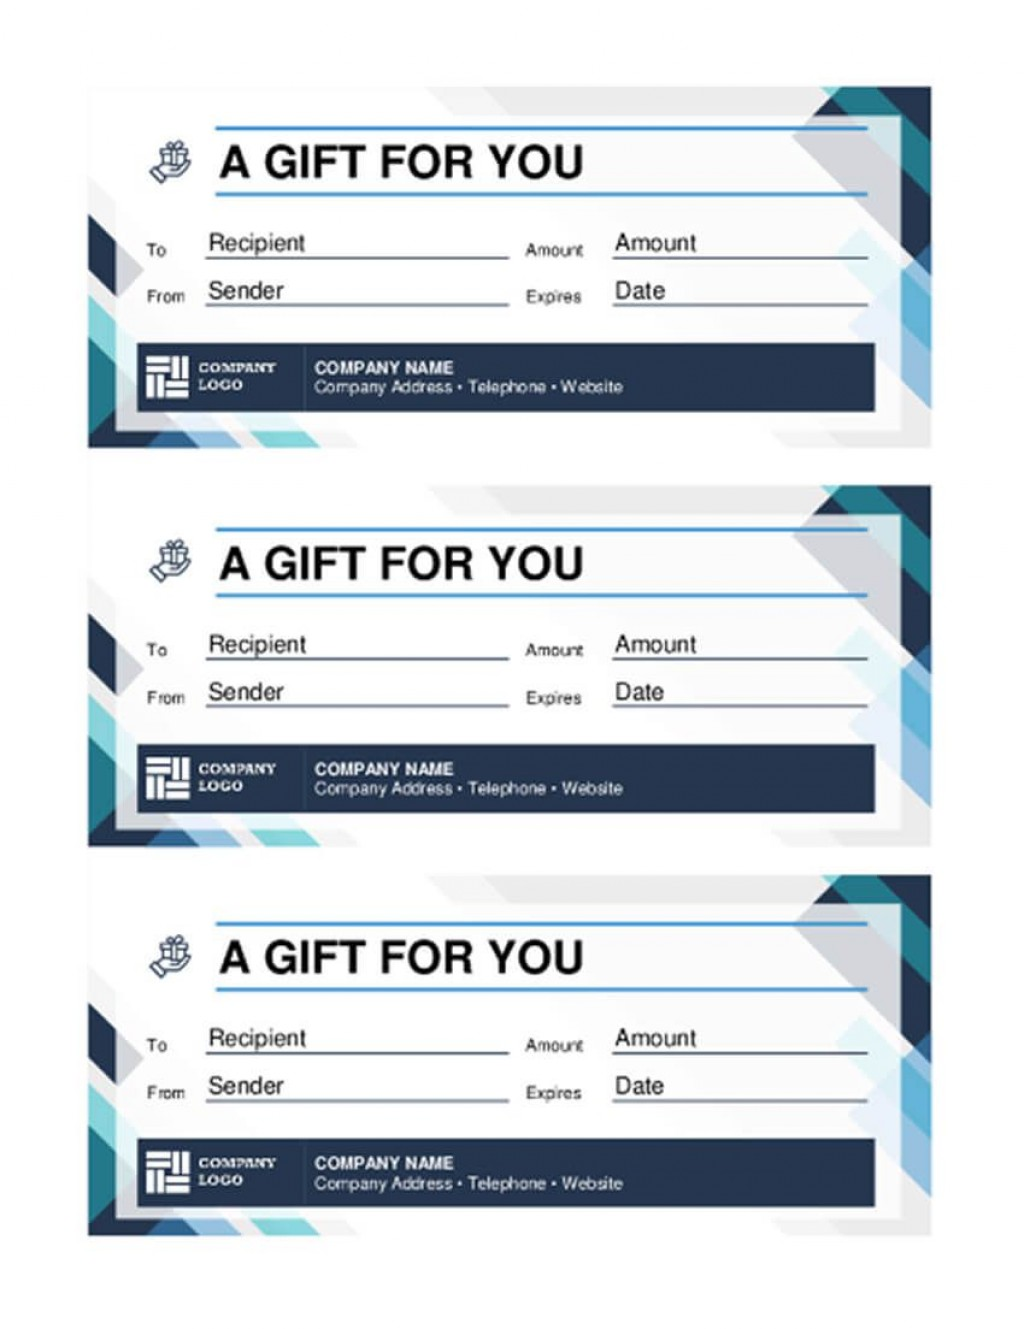 001 Unique Restaurant Gift Certificate Template Design  Templates Card Word Voucher FreeLarge